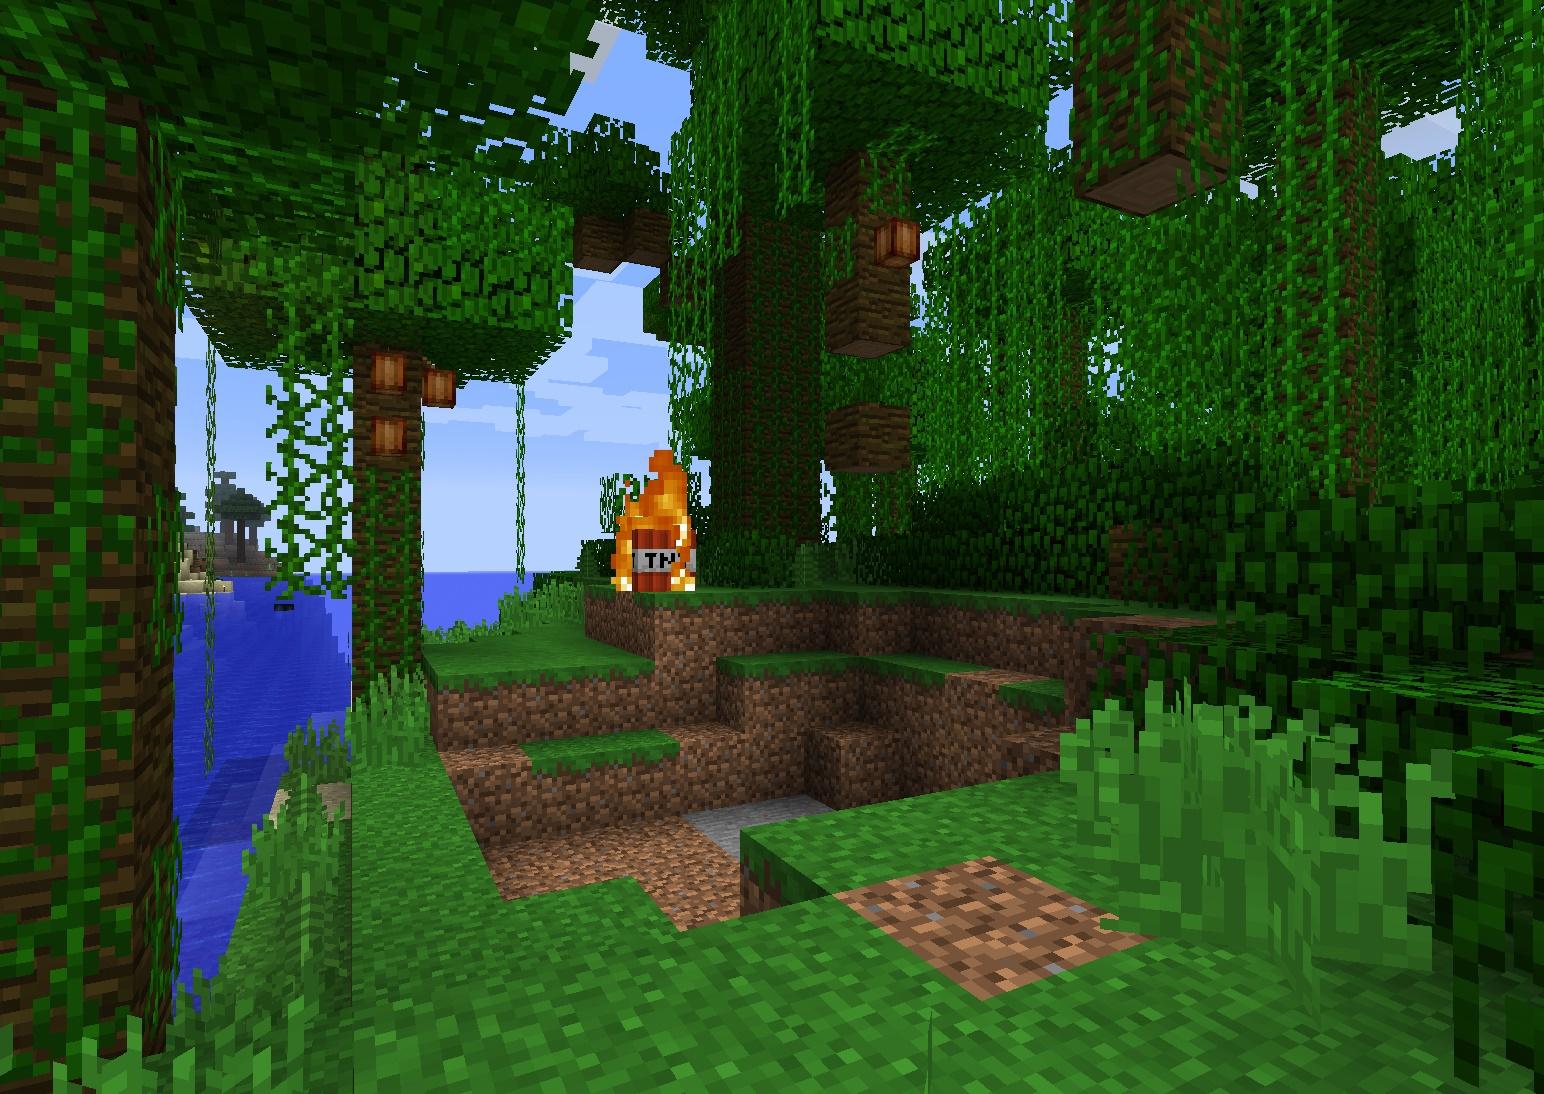 мыши джунглей майнкрафте #2